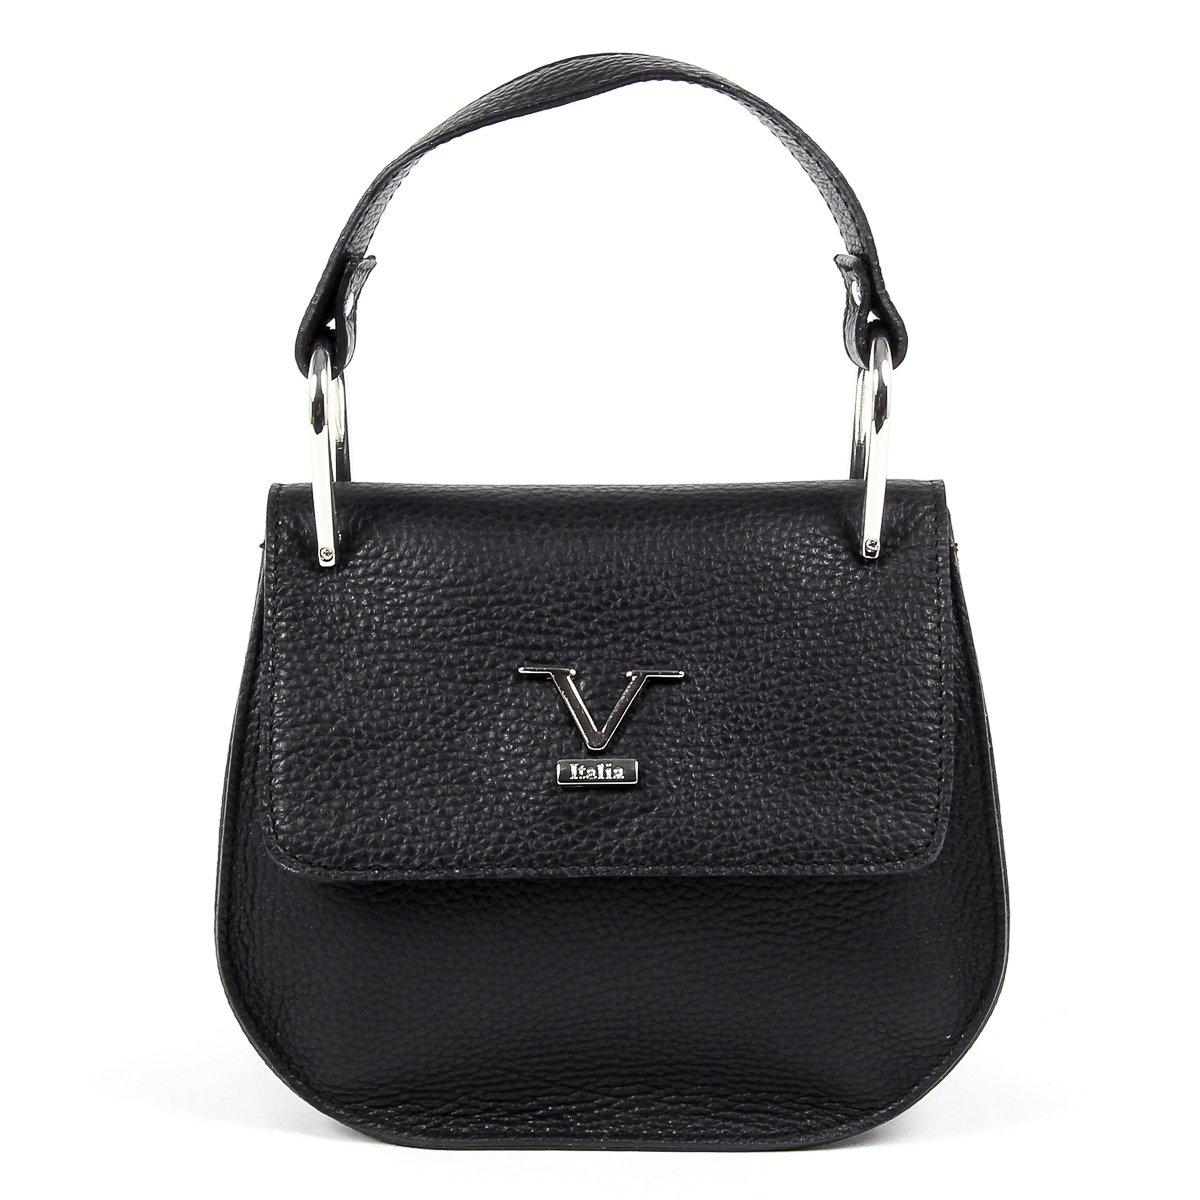 V 1969 Italia Womens #Handbag Black DUBLINO 72% #OFF  http:// tiny.youhawk.com/c593  &nbsp;   Just a few in stock! #fashion #style #bag #shop #youhawk<br>http://pic.twitter.com/9u9UISLcFg